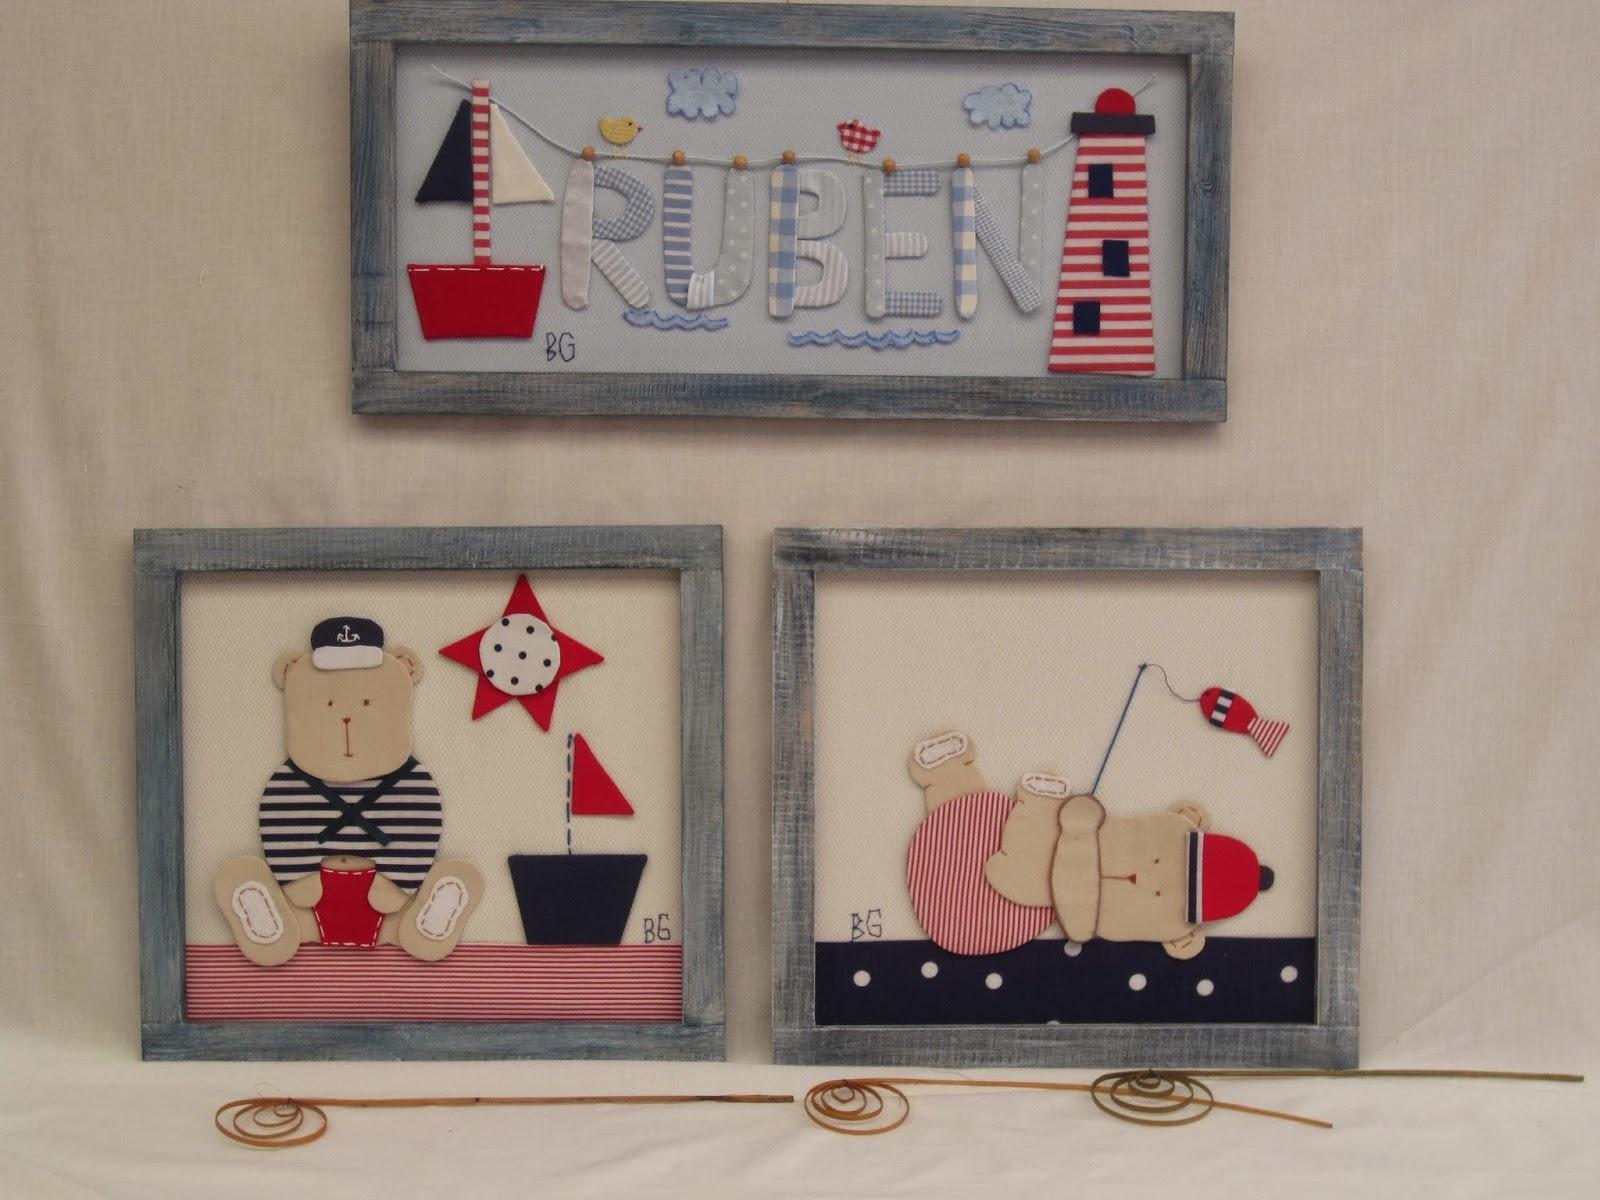 Begotelas cuadros infantiles de ositos - Motivos infantiles para decorar ...